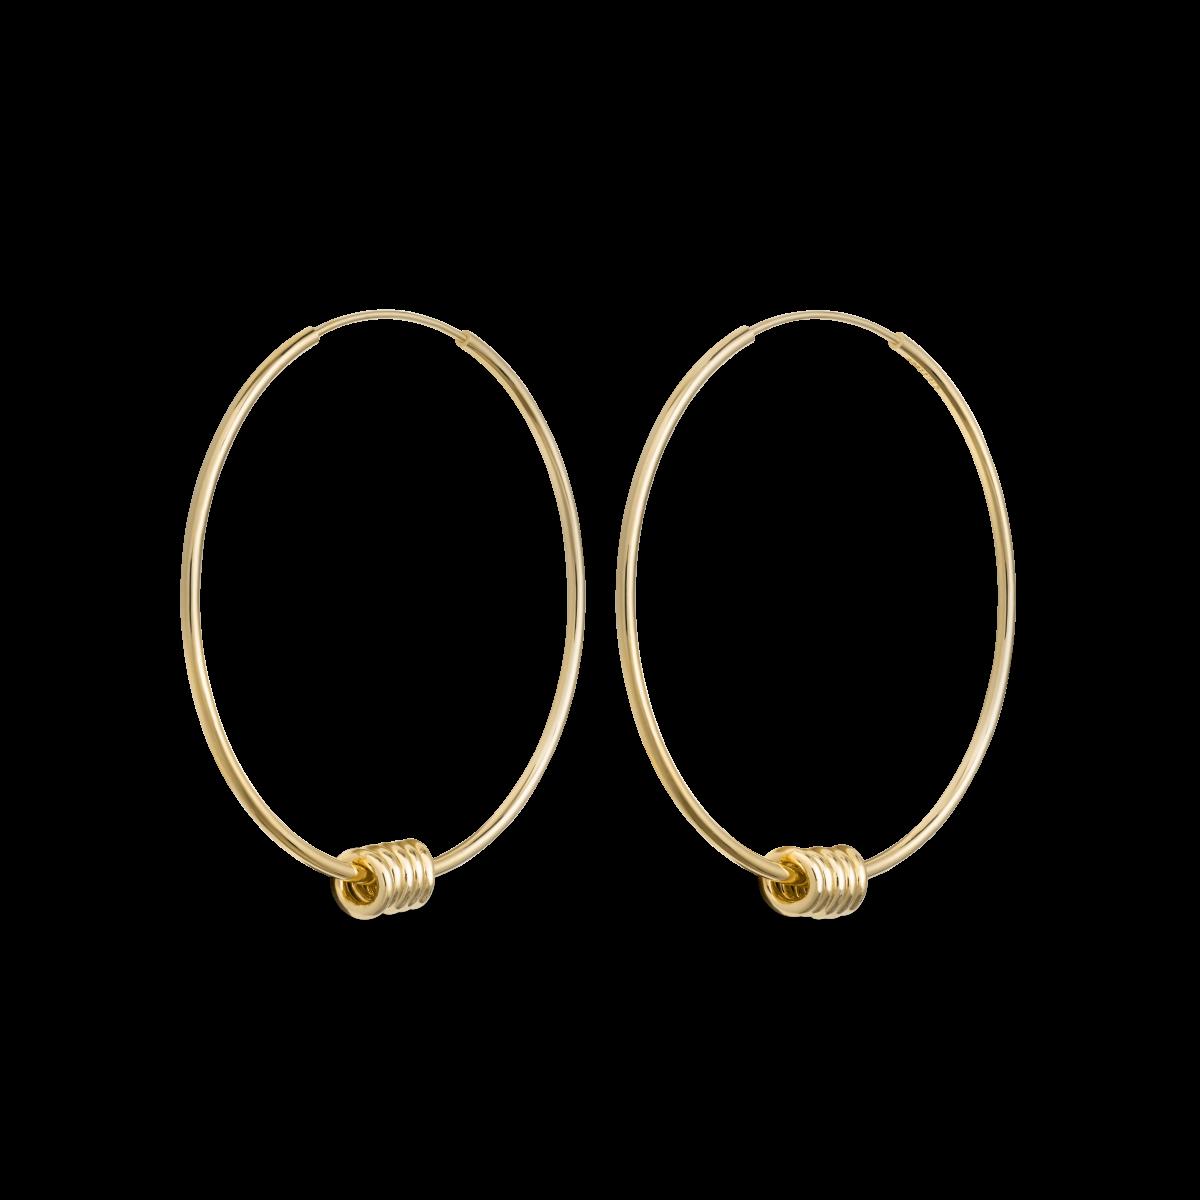 Promo : Boucles d'oreilles Rosefield JSHLG-J065 Femme